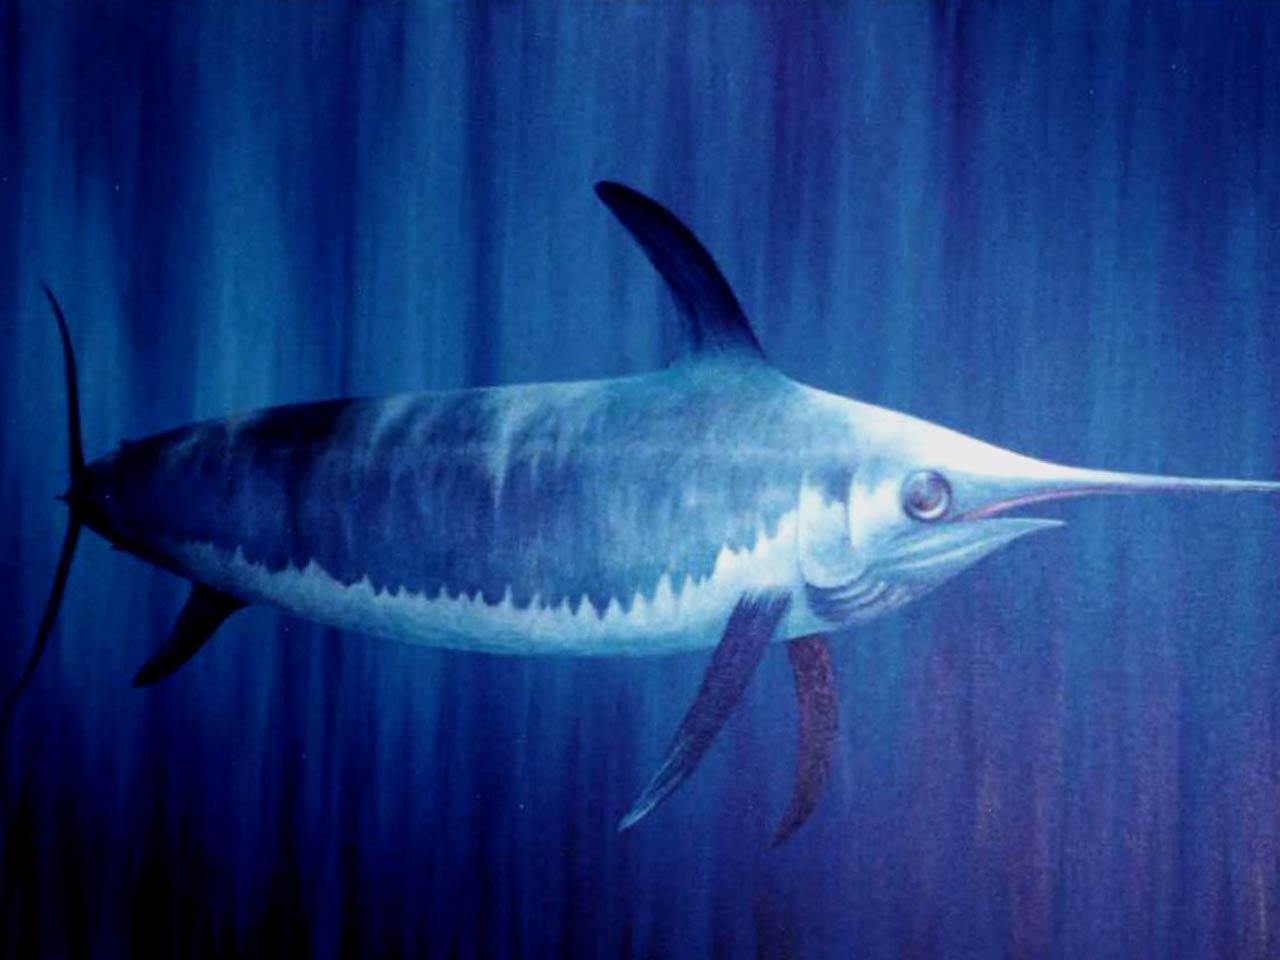 free Swordfish wallpaper wallpapers download